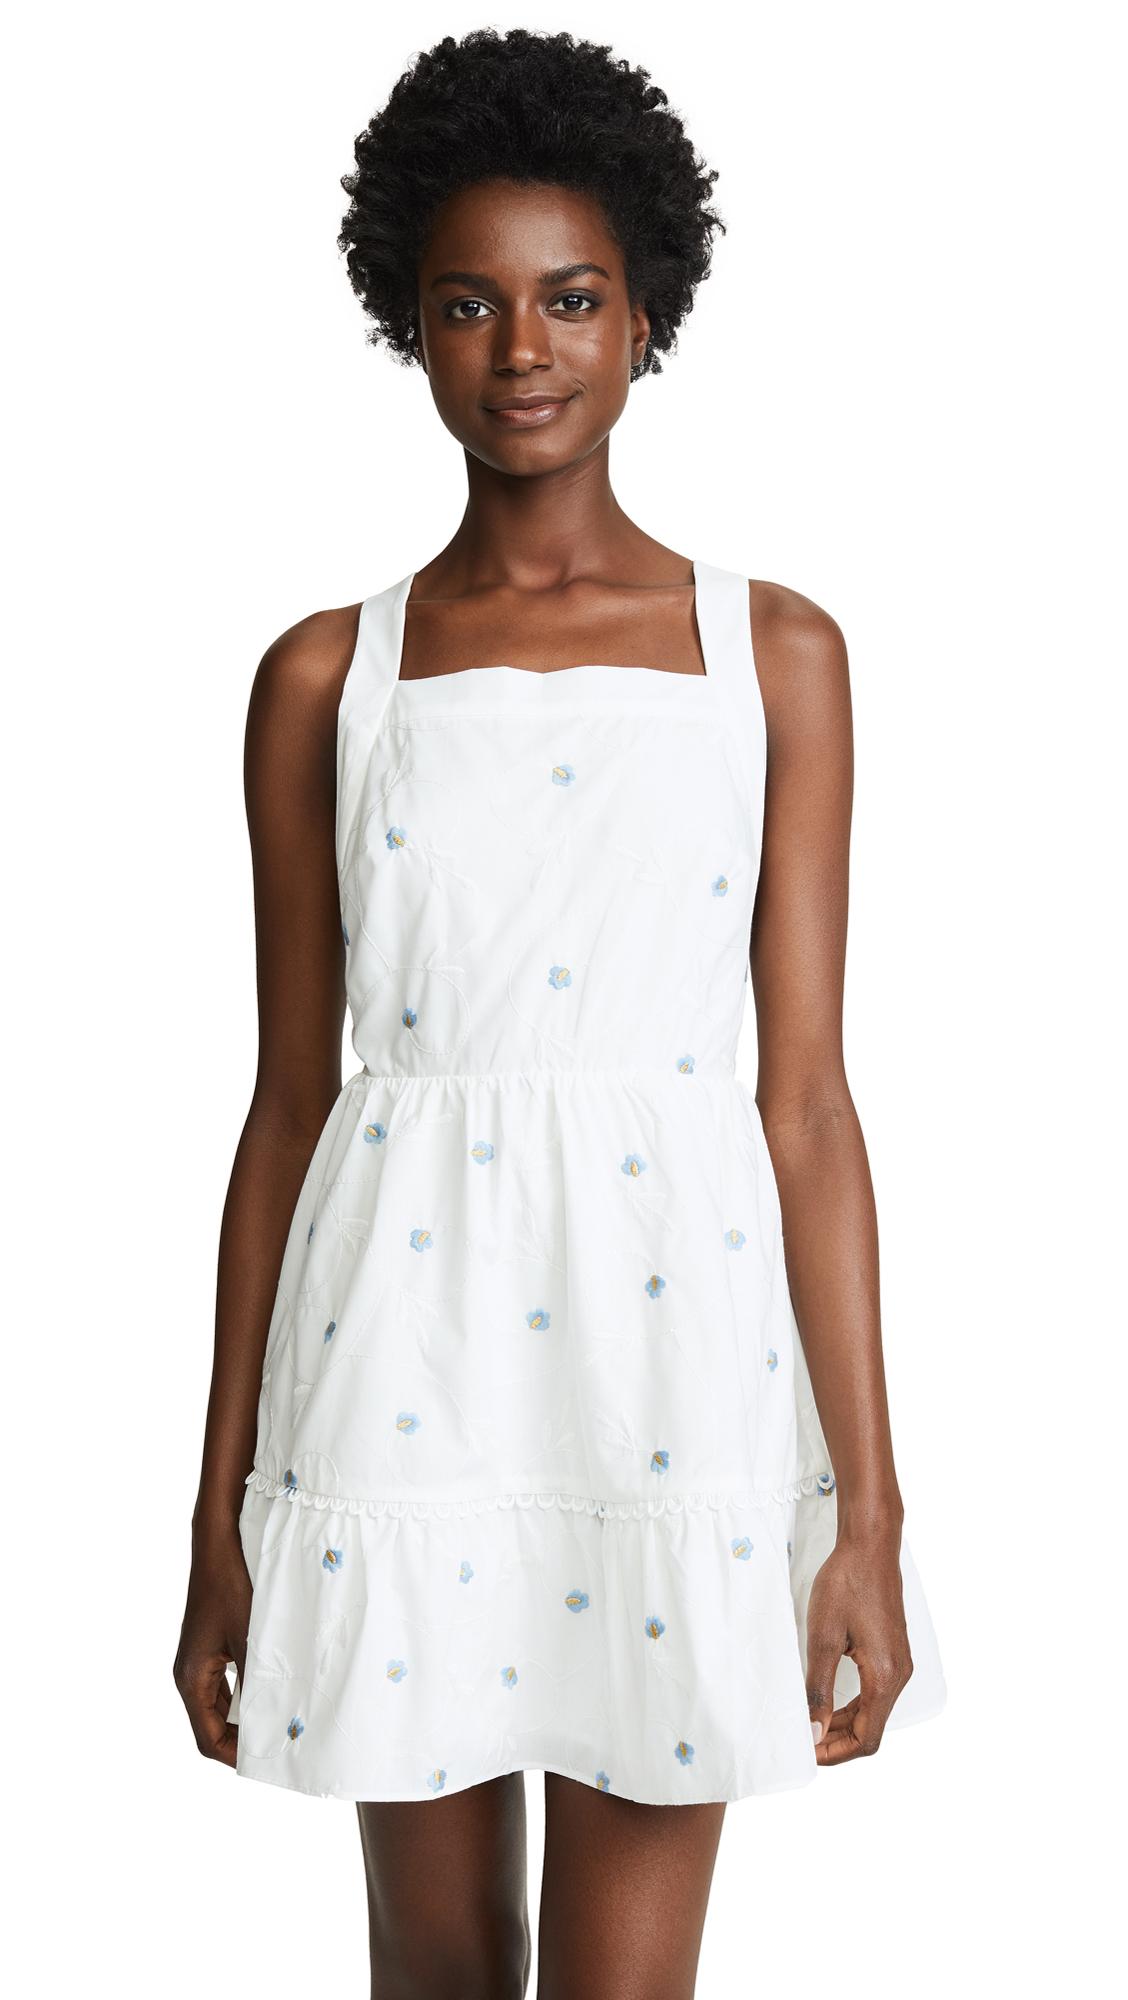 Stevie May Delirium Apron Mini Dress In Off White/Stone Blue